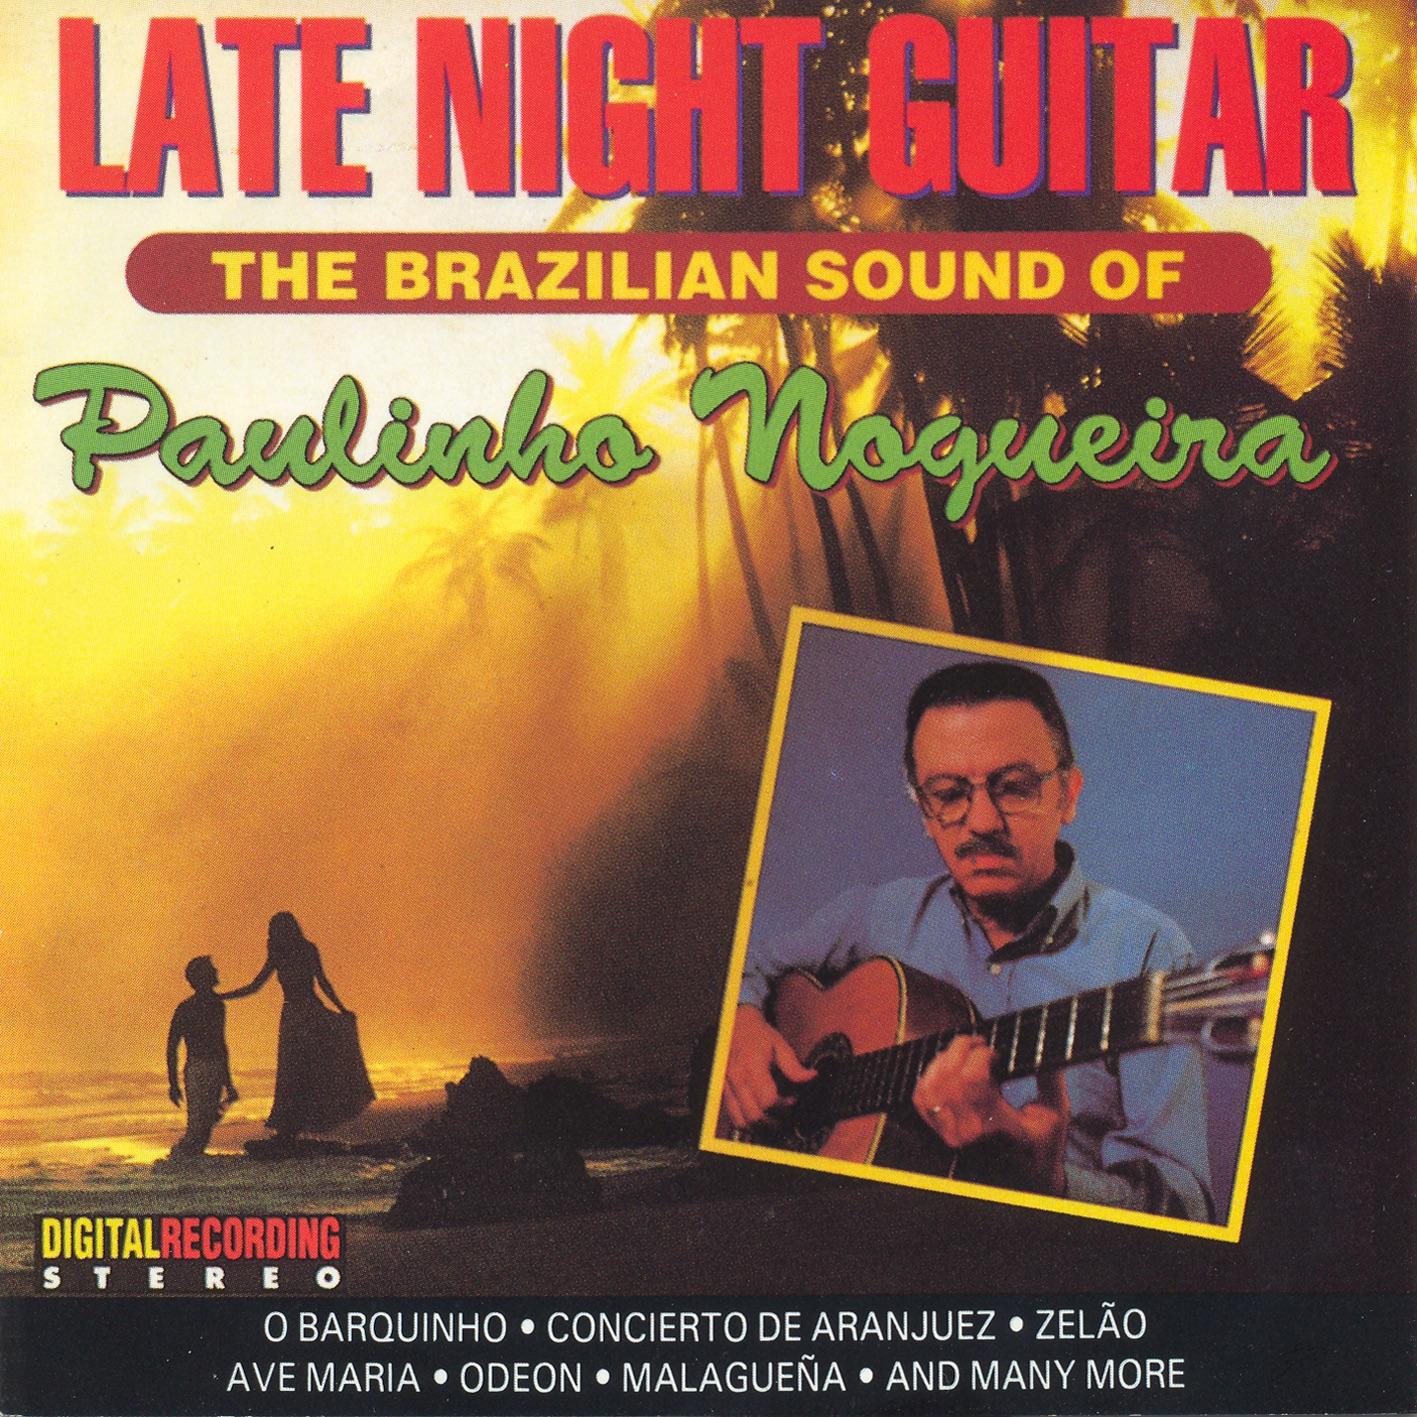 Brazil Paulinho Nogueira: the Brazilian Sound of the Late Night Guitar